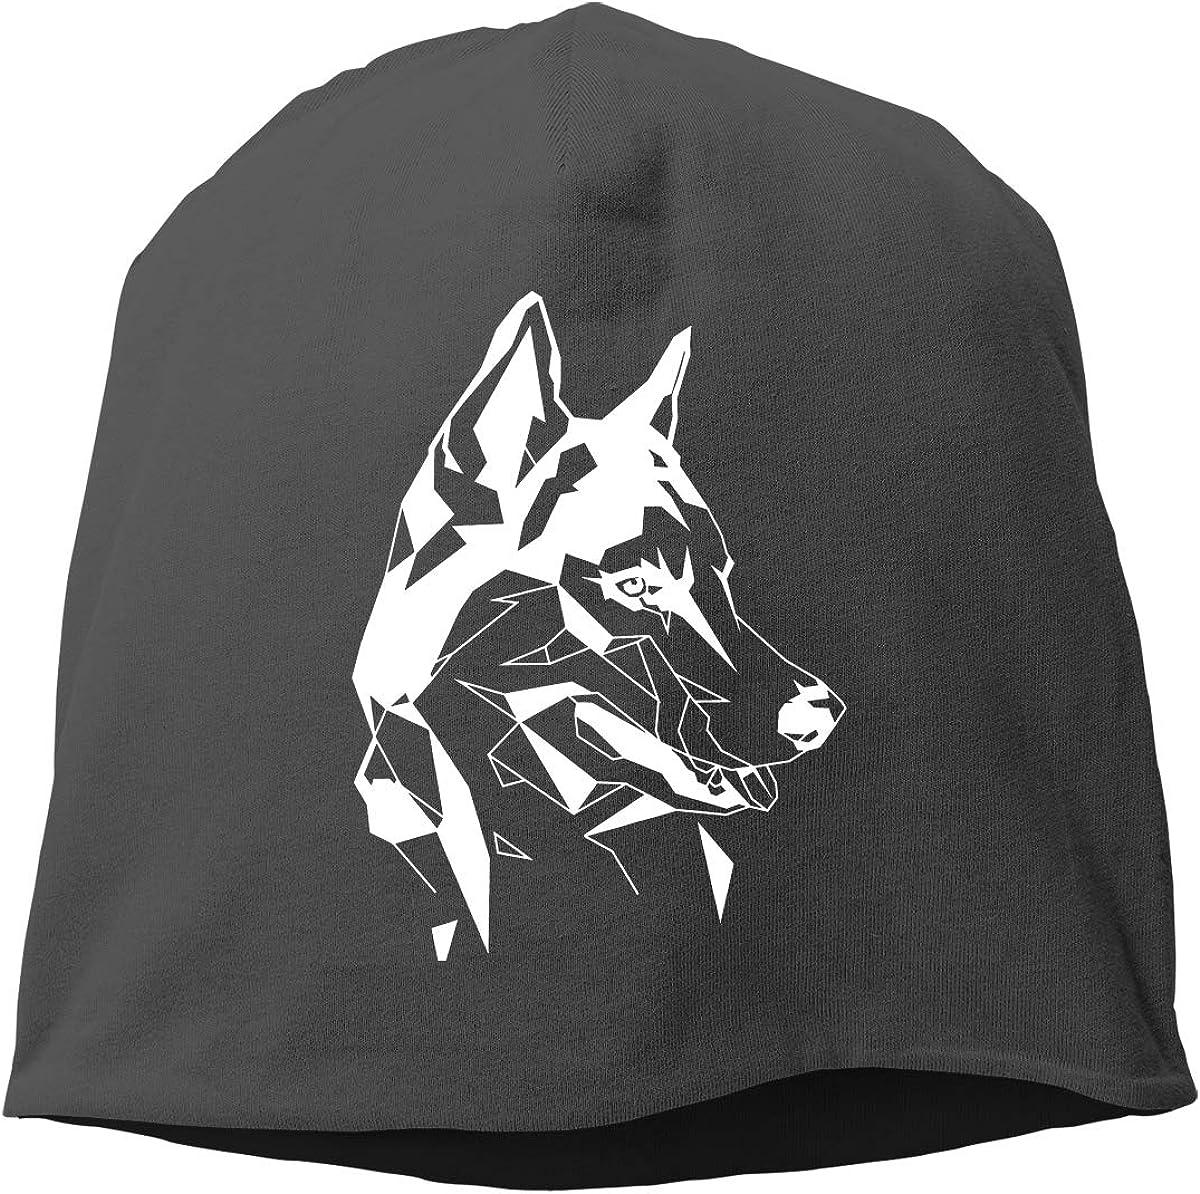 Husky Pattern Unisex Knitted Hat Beanie Hat Warm Hats Skull Cap